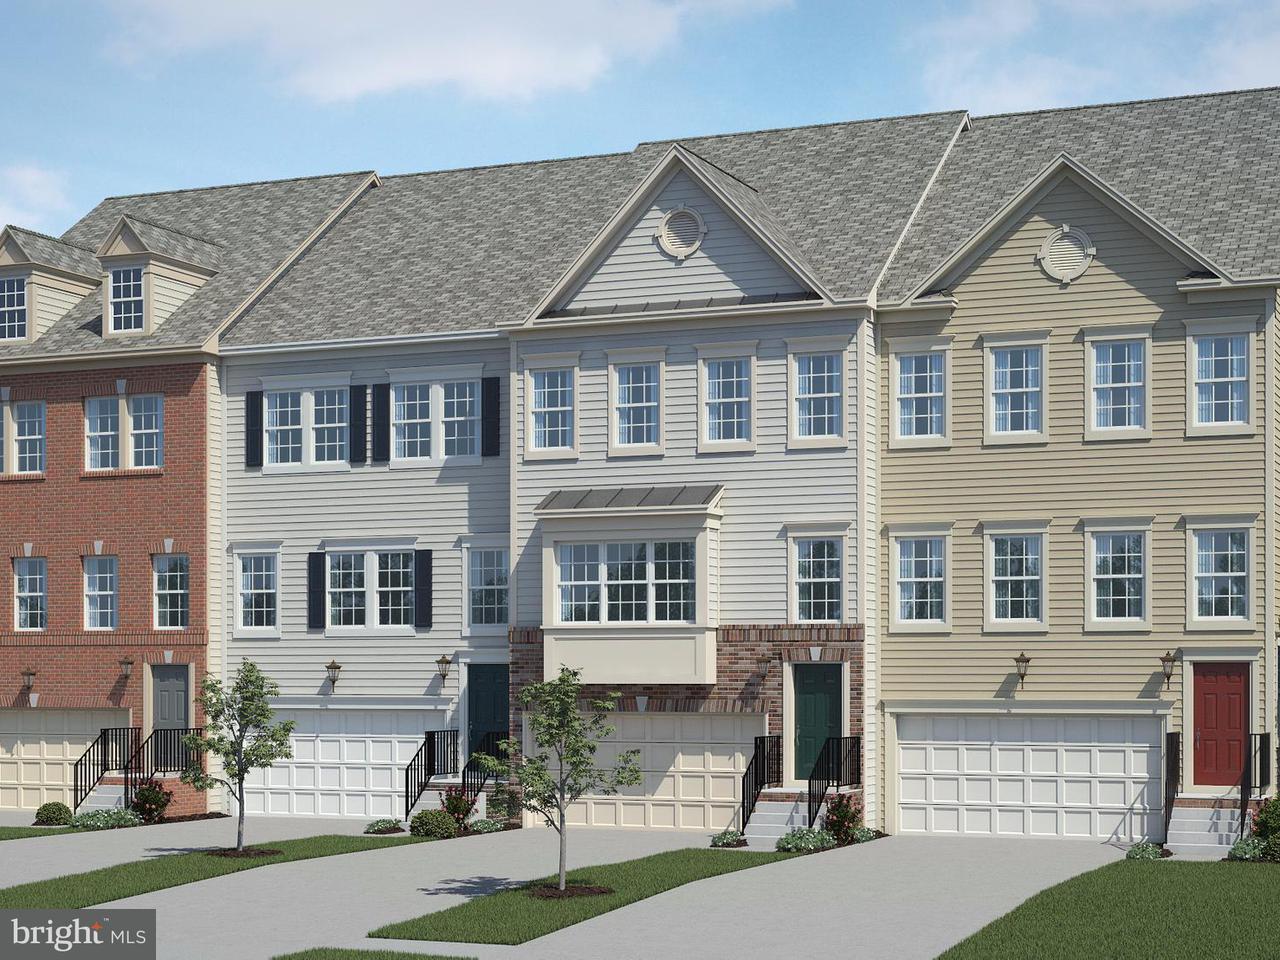 Townhouse for Sale at 2515 HYACINTH Lane 2515 HYACINTH Lane Gambrills, Maryland 21054 United States